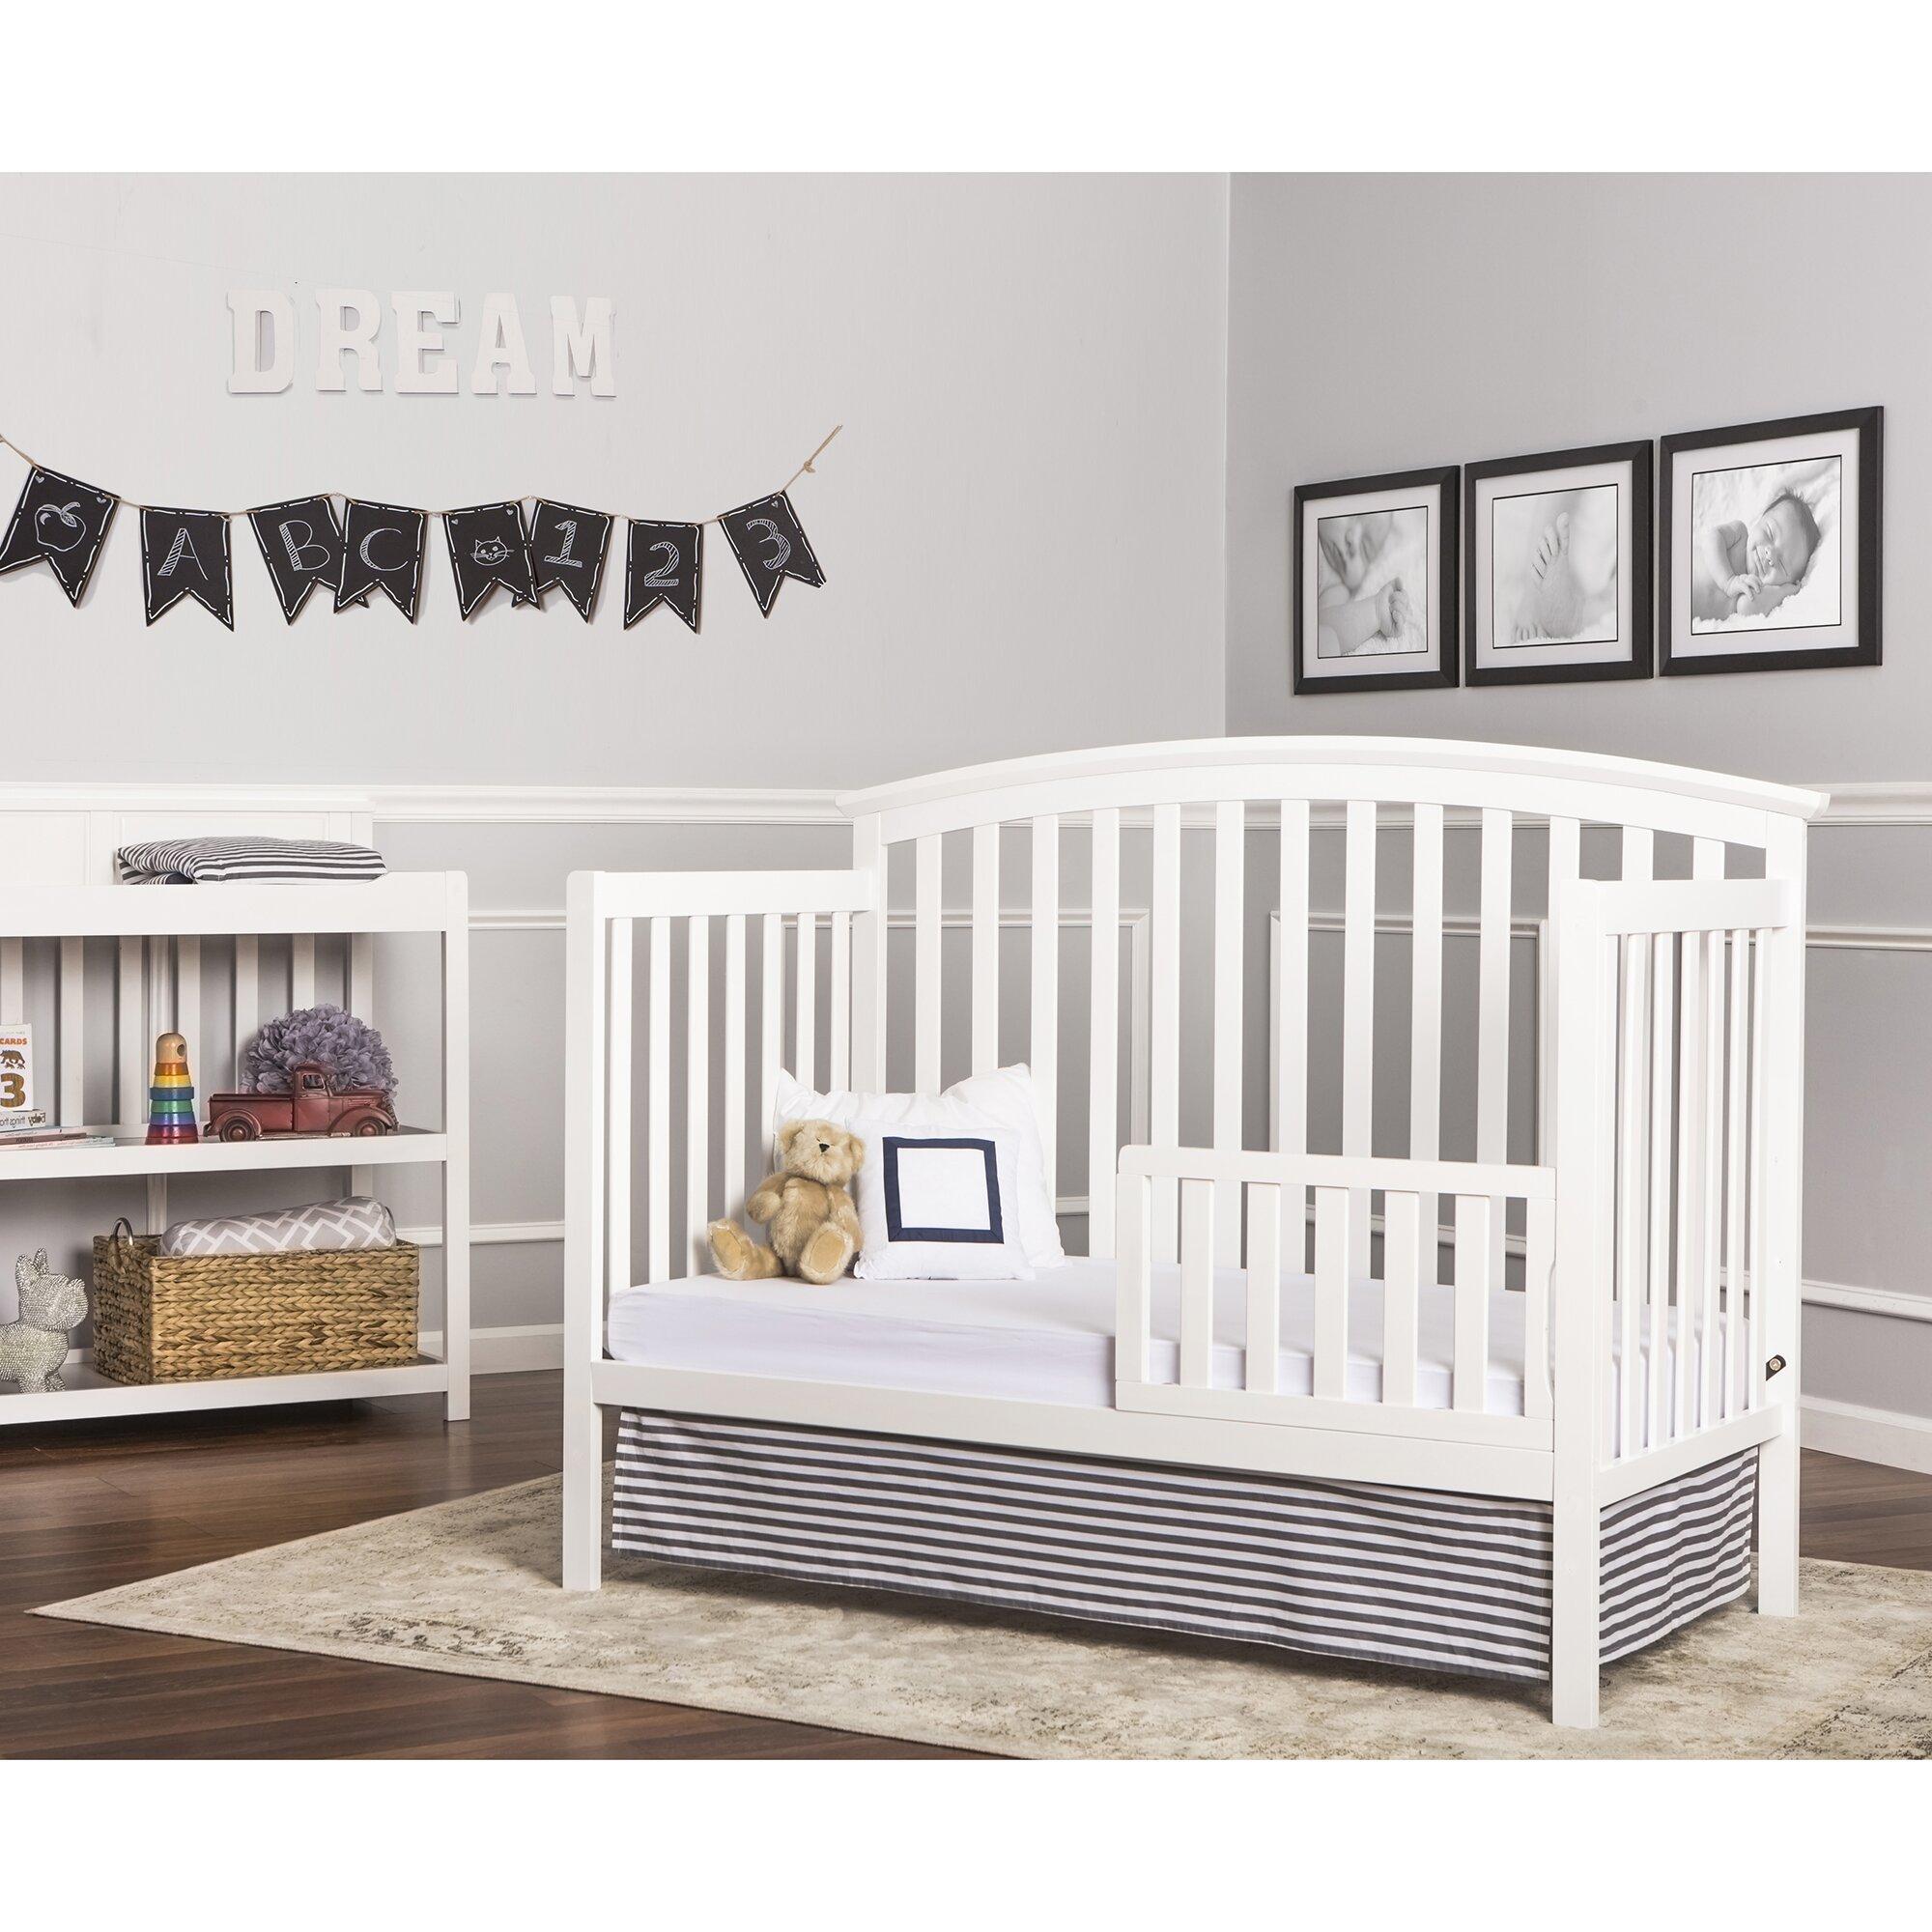 Crib for sale charleston sc - Dream On Me Eden 4 In 1 Convertible Crib